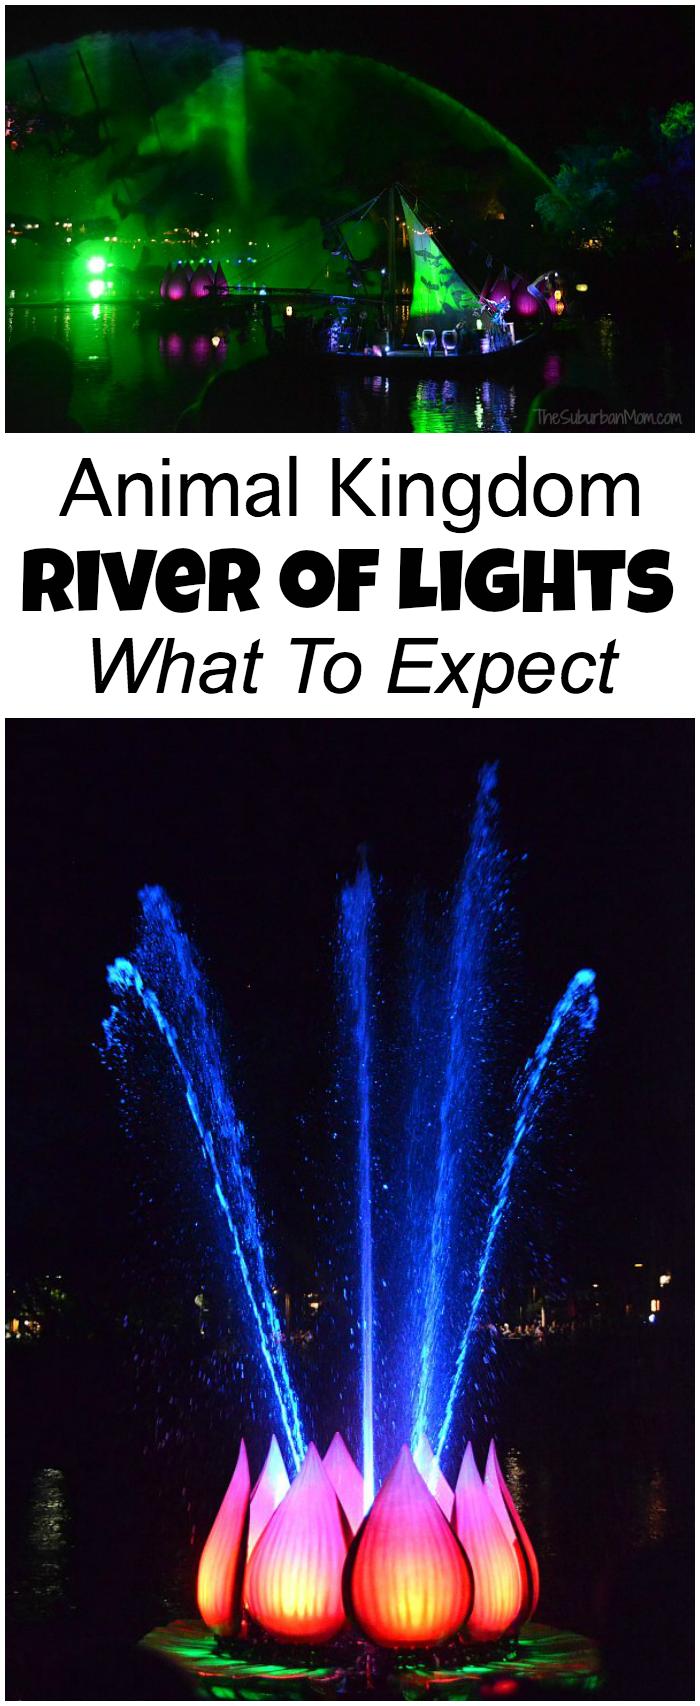 Animal Kingdom River Of Lights